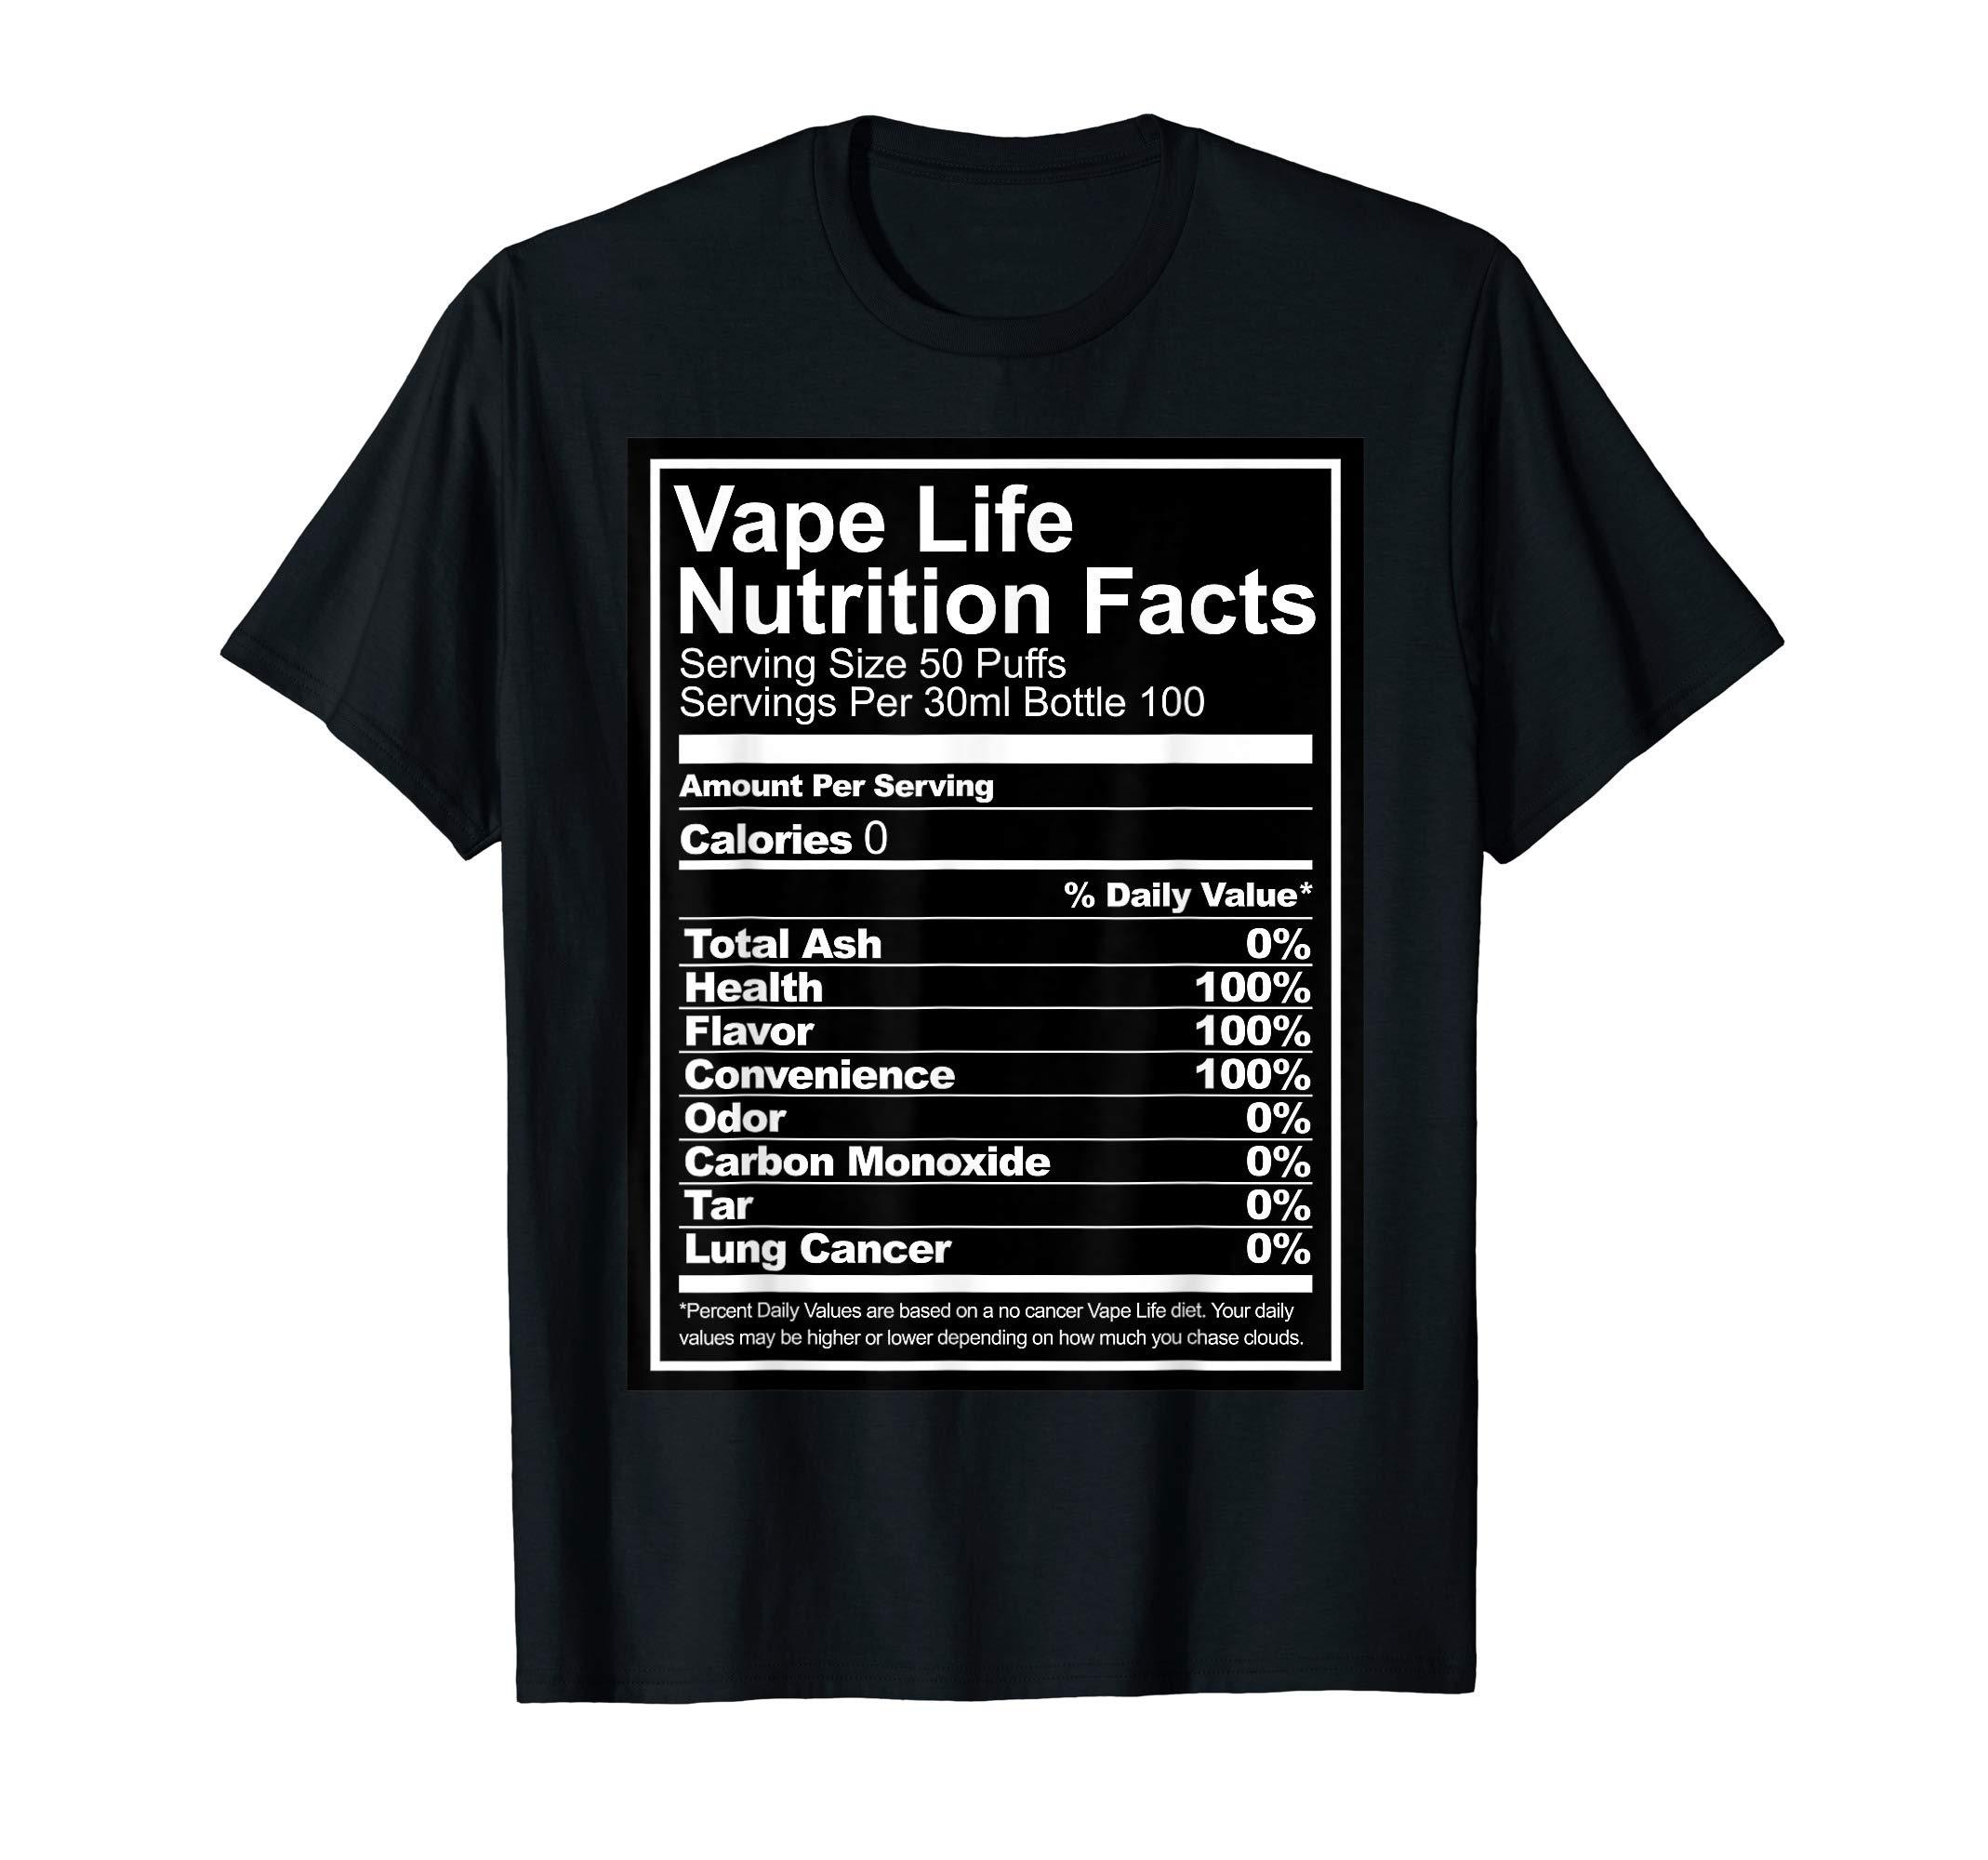 Galleon - Vape Life Nutrition Facts - Vaping T-Shirt - Vaper Tee